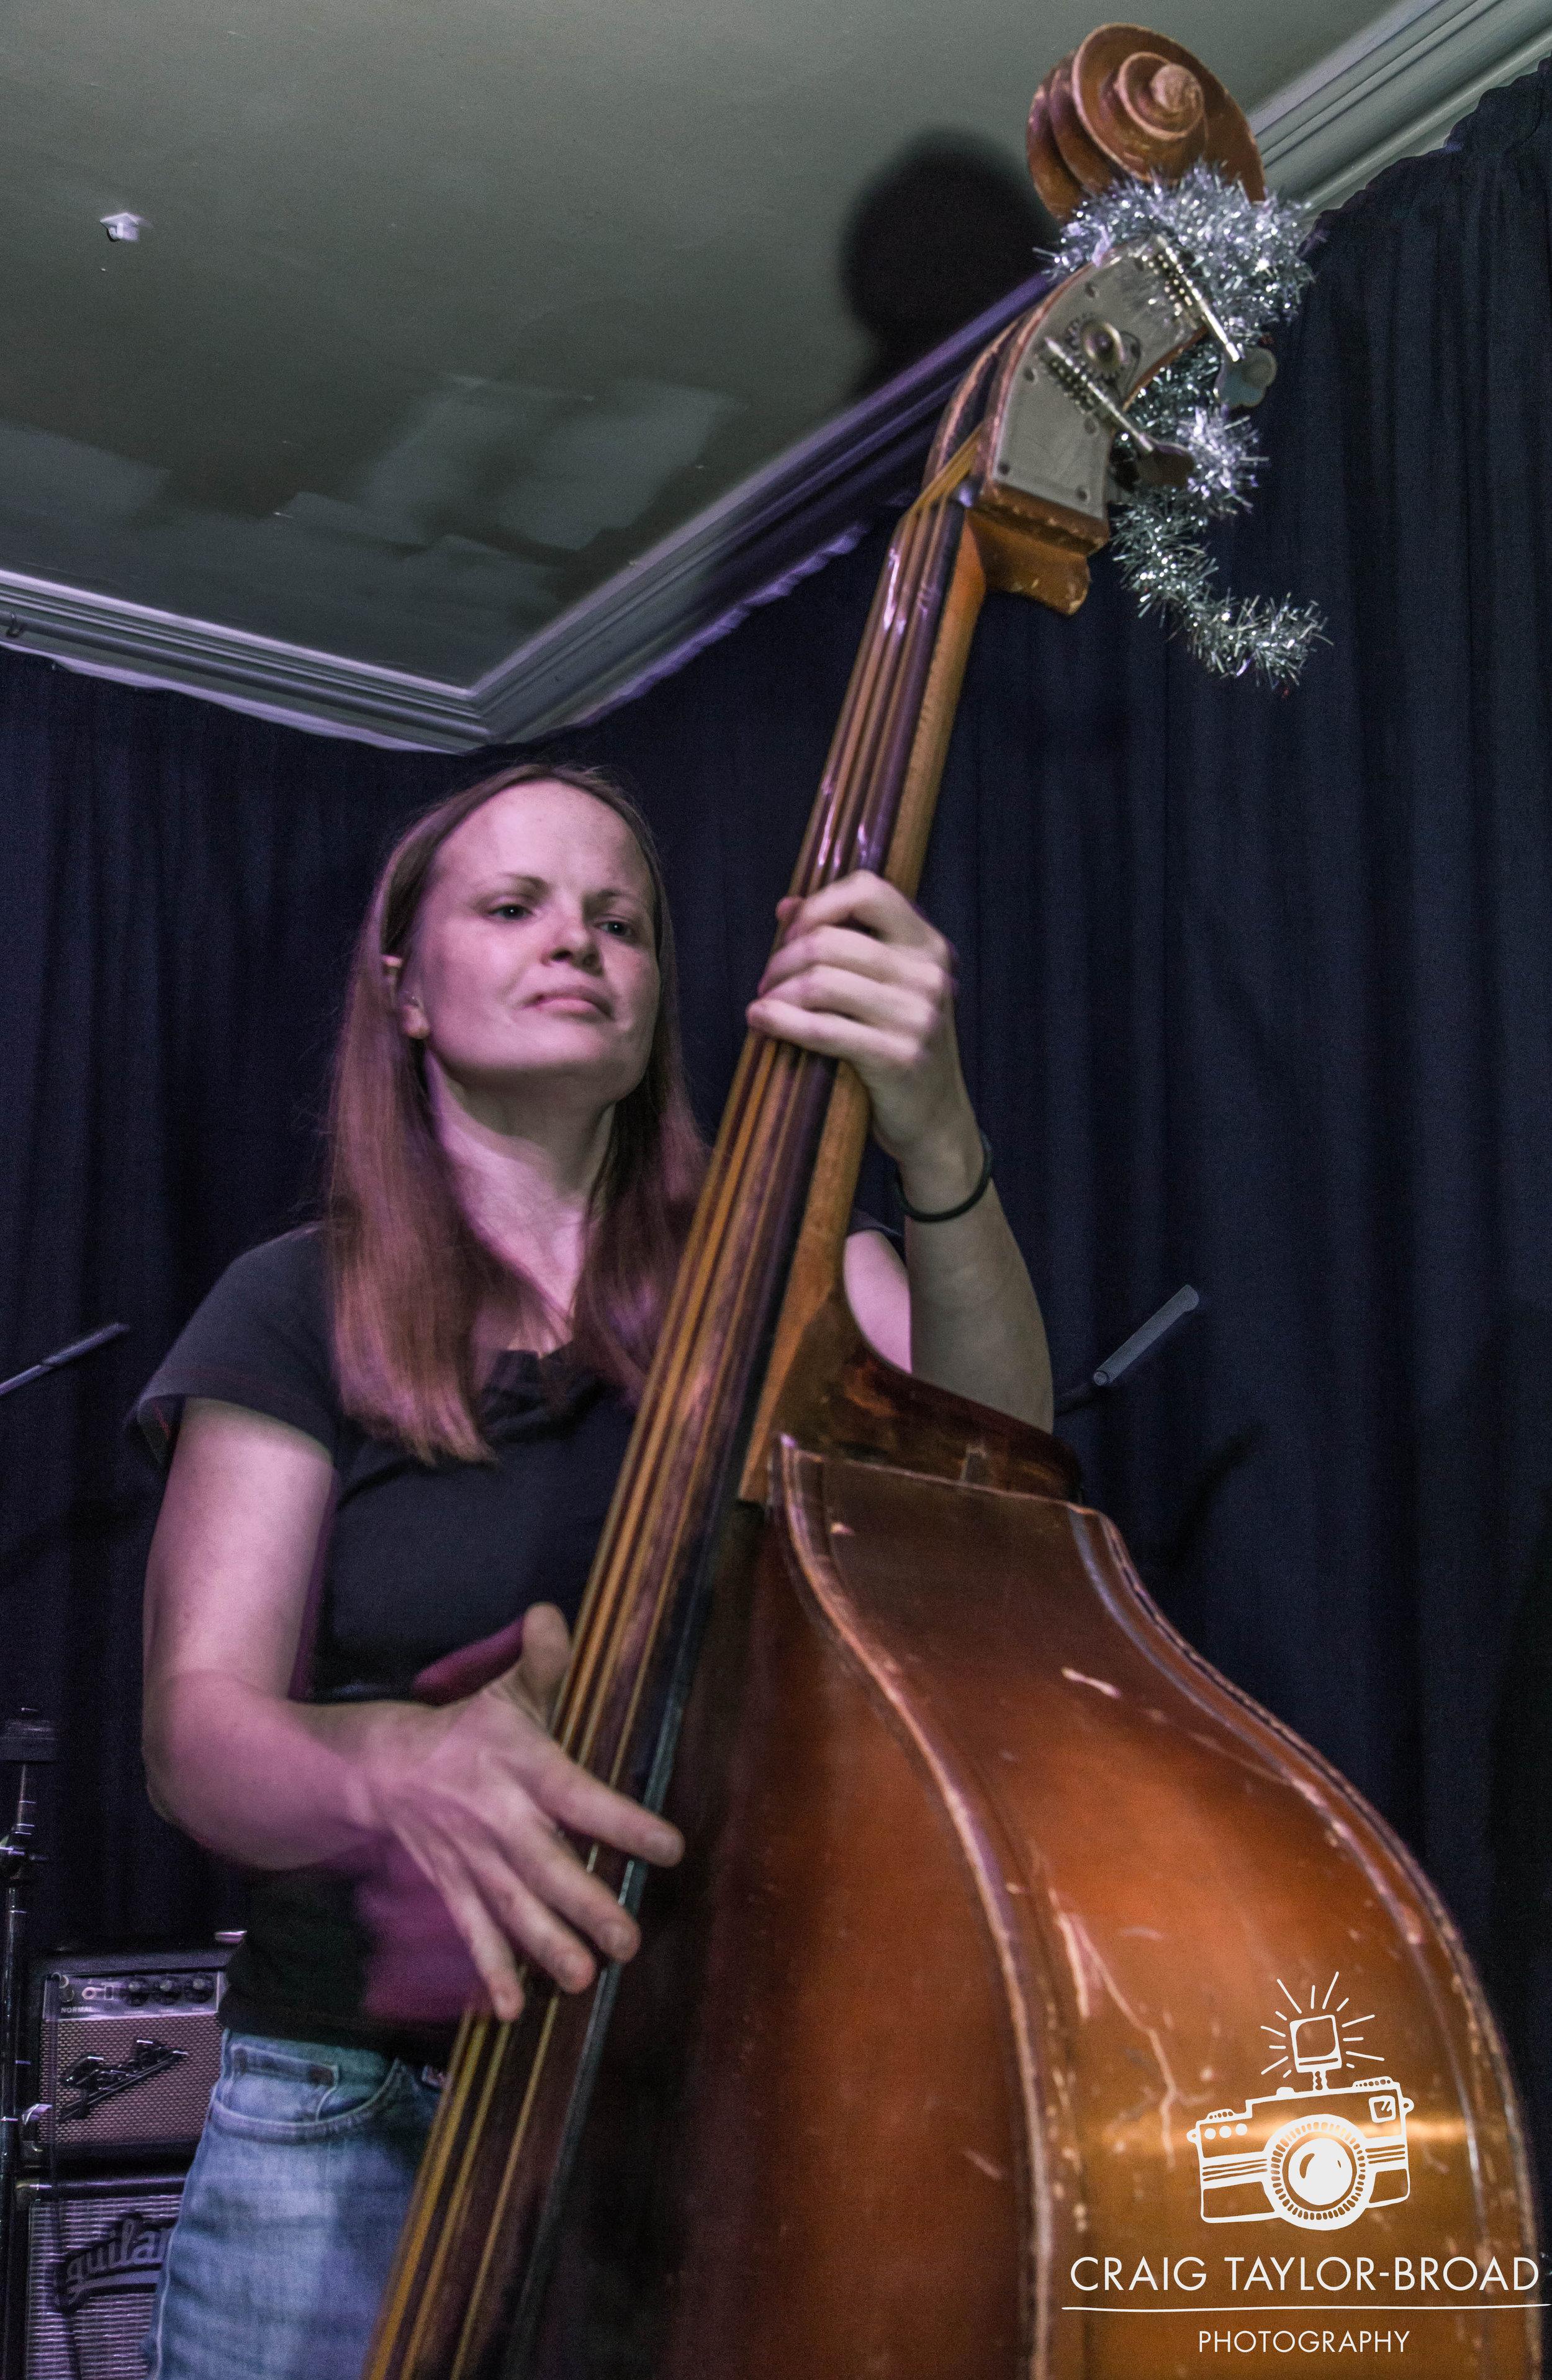 The Sarah Marie Band